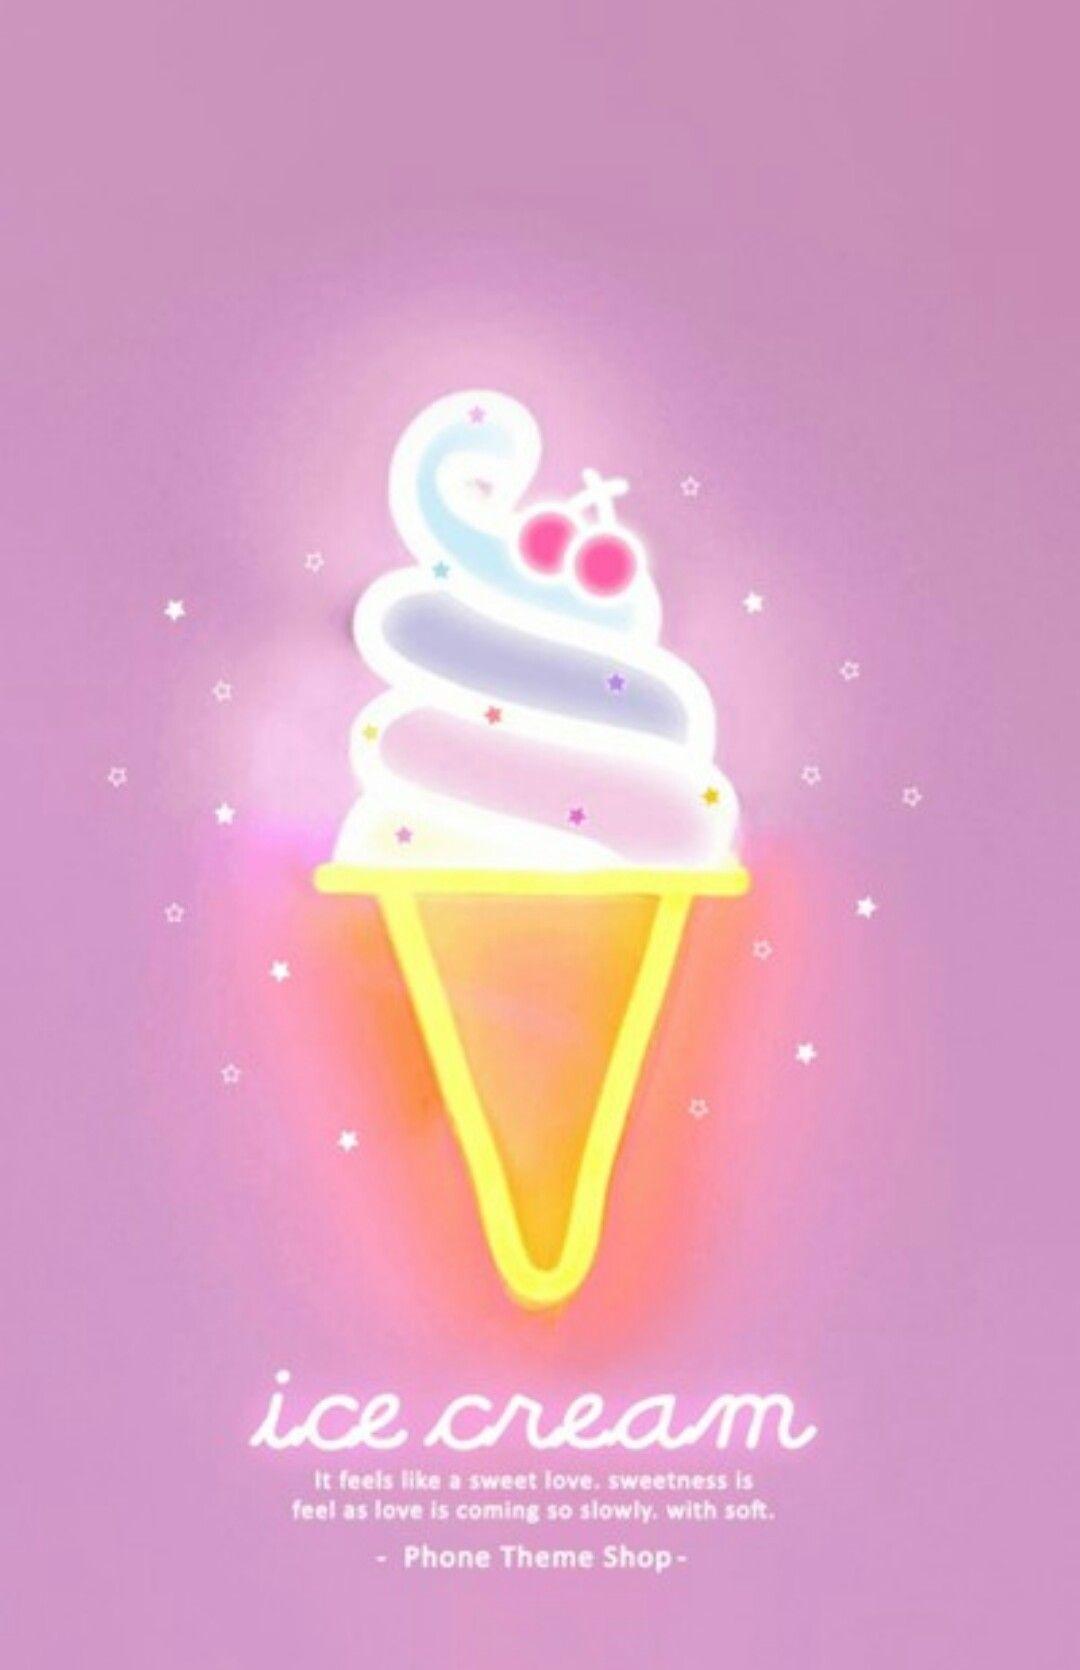 Neon Cute Ice Cream Wallpaper Neon Wallpaper Iphone Wallpaper Pink Wallpaper Aesthetic ice cream wallpaper tumblr